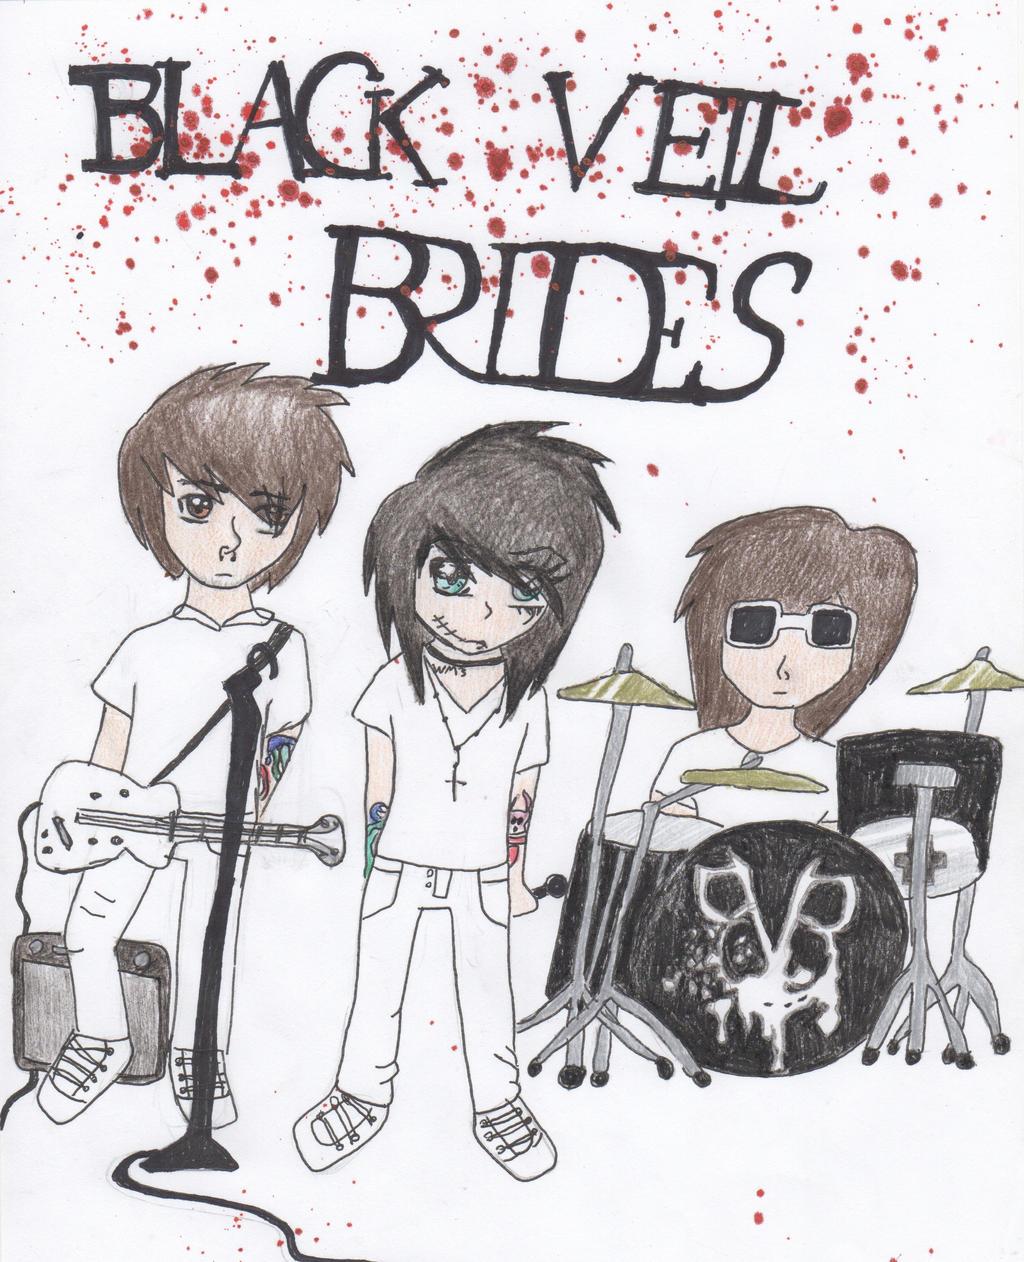 black veil brides 2017 poster - photo #27